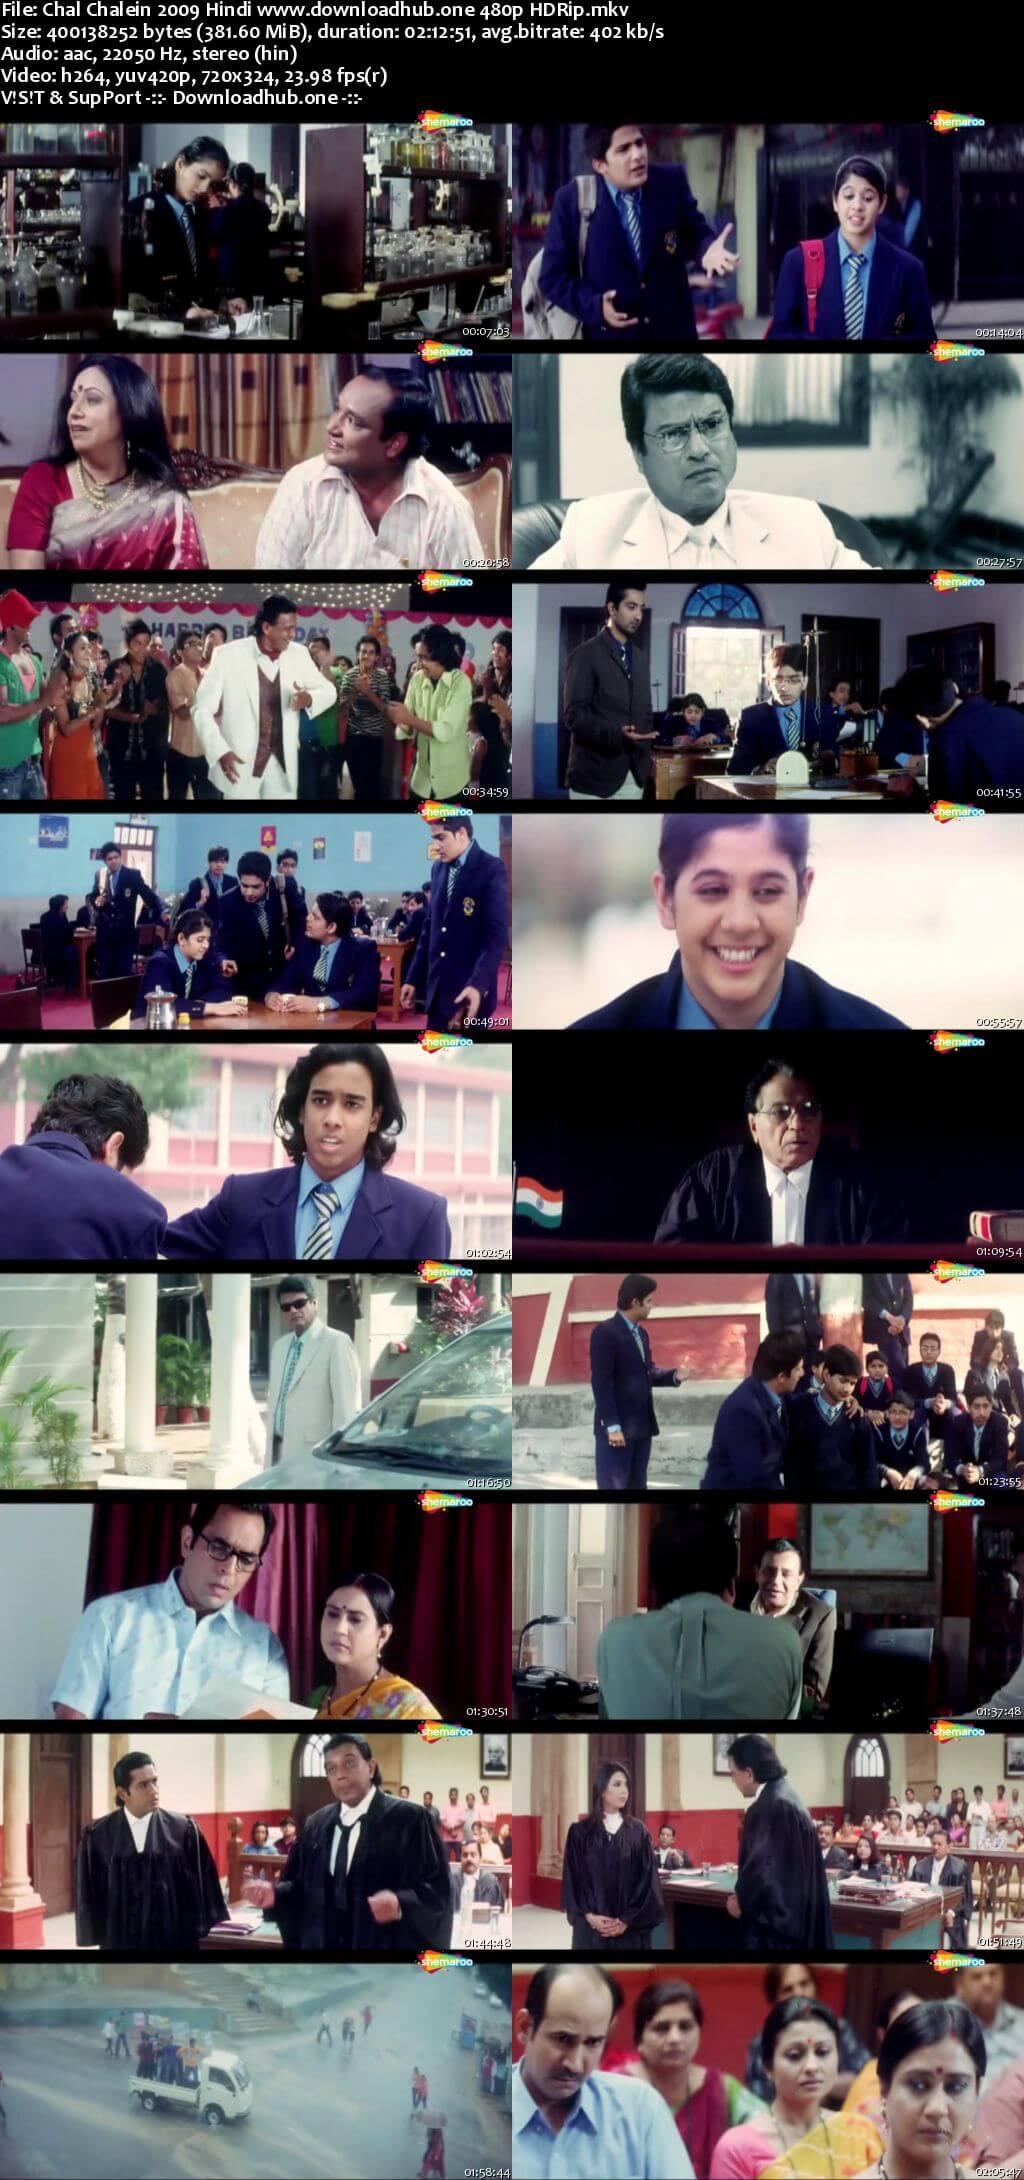 Chal Chalein 2009 Hindi 350MB HDRip 480p